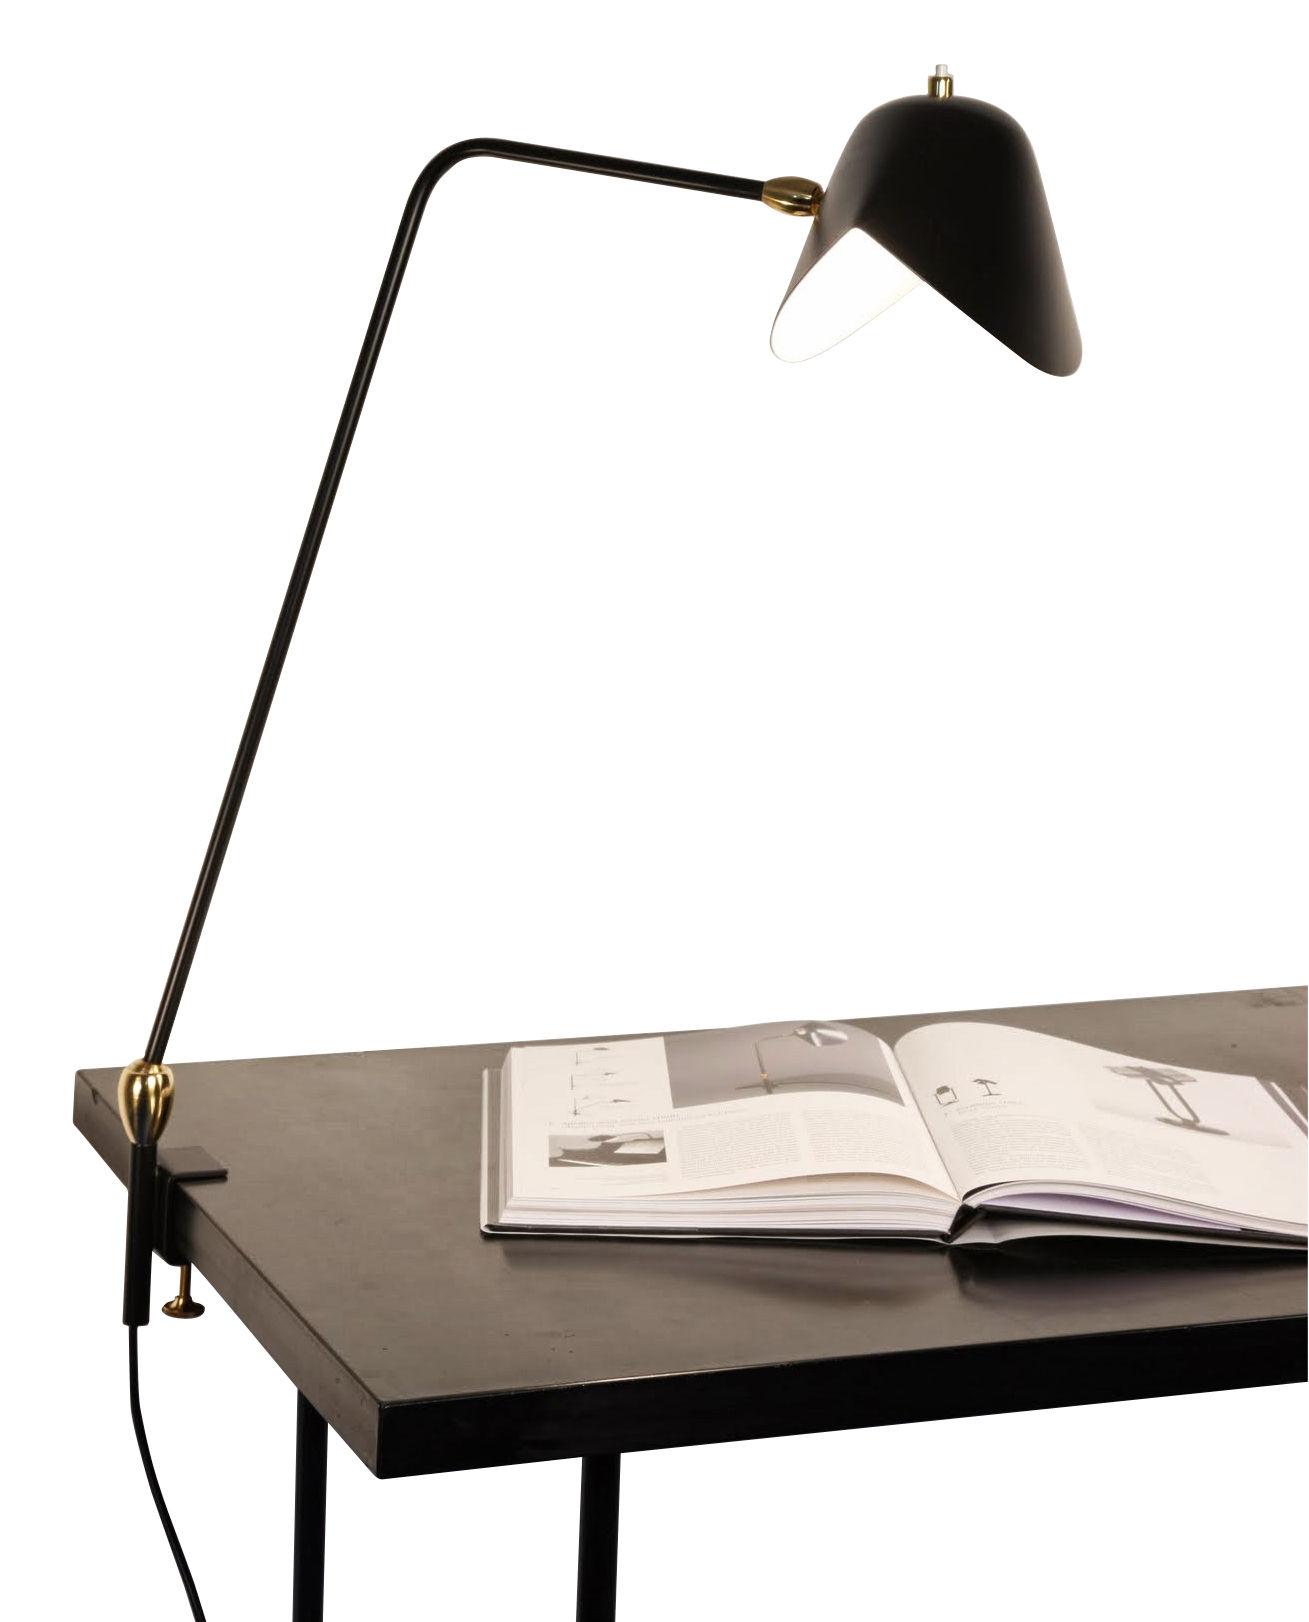 lampe d 39 architecte agraf e 2 rotules base tau 1957 noir serge mouille. Black Bedroom Furniture Sets. Home Design Ideas